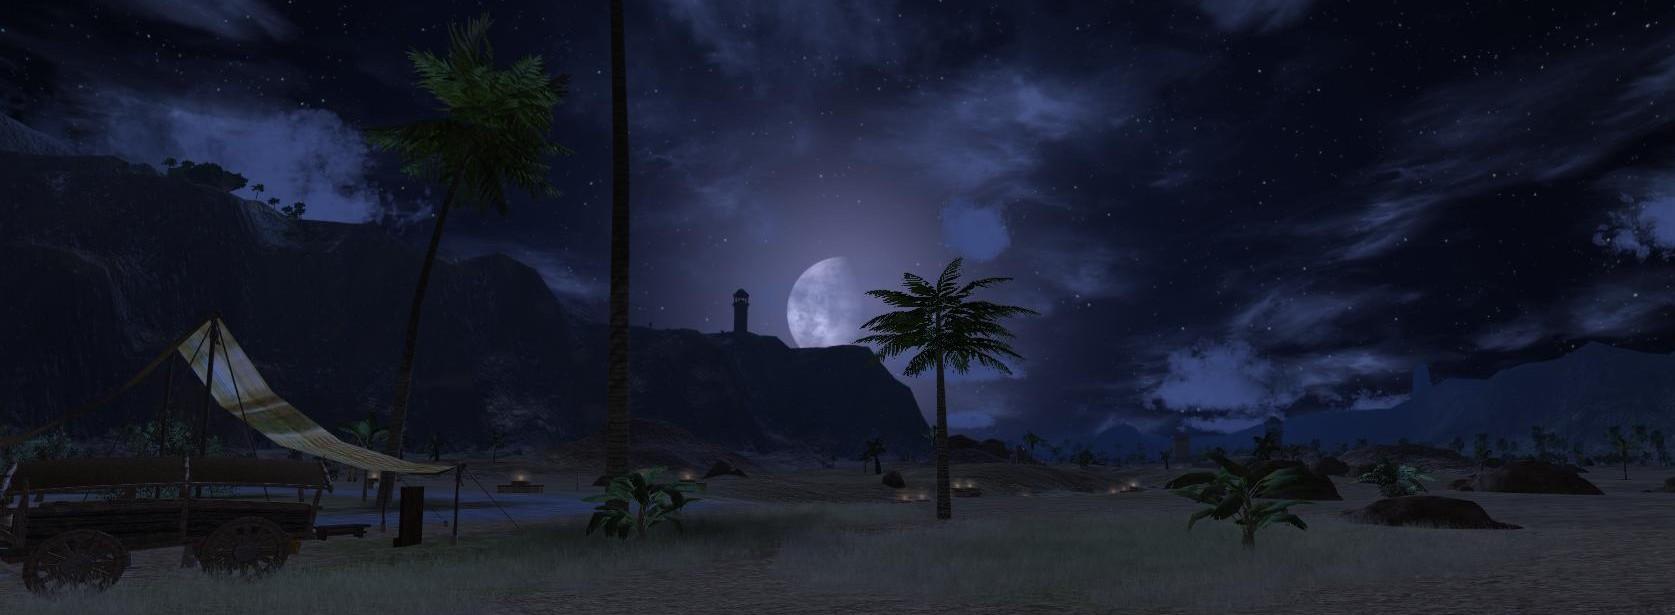 vanguard_the plains of khal